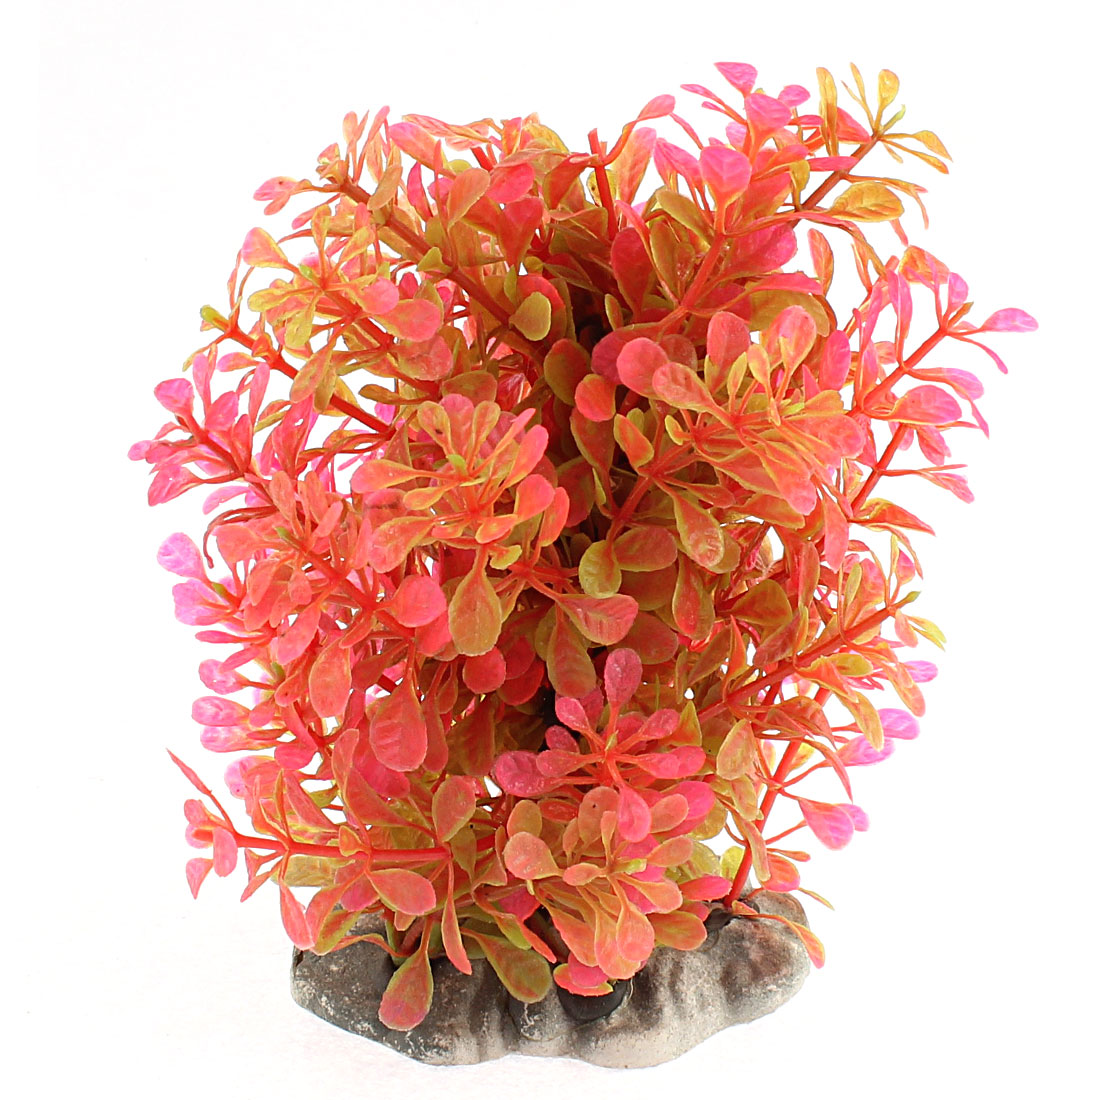 Aquarium Fishbowl Plastic Simulation Water Plant Grass Decoration Hot Pink